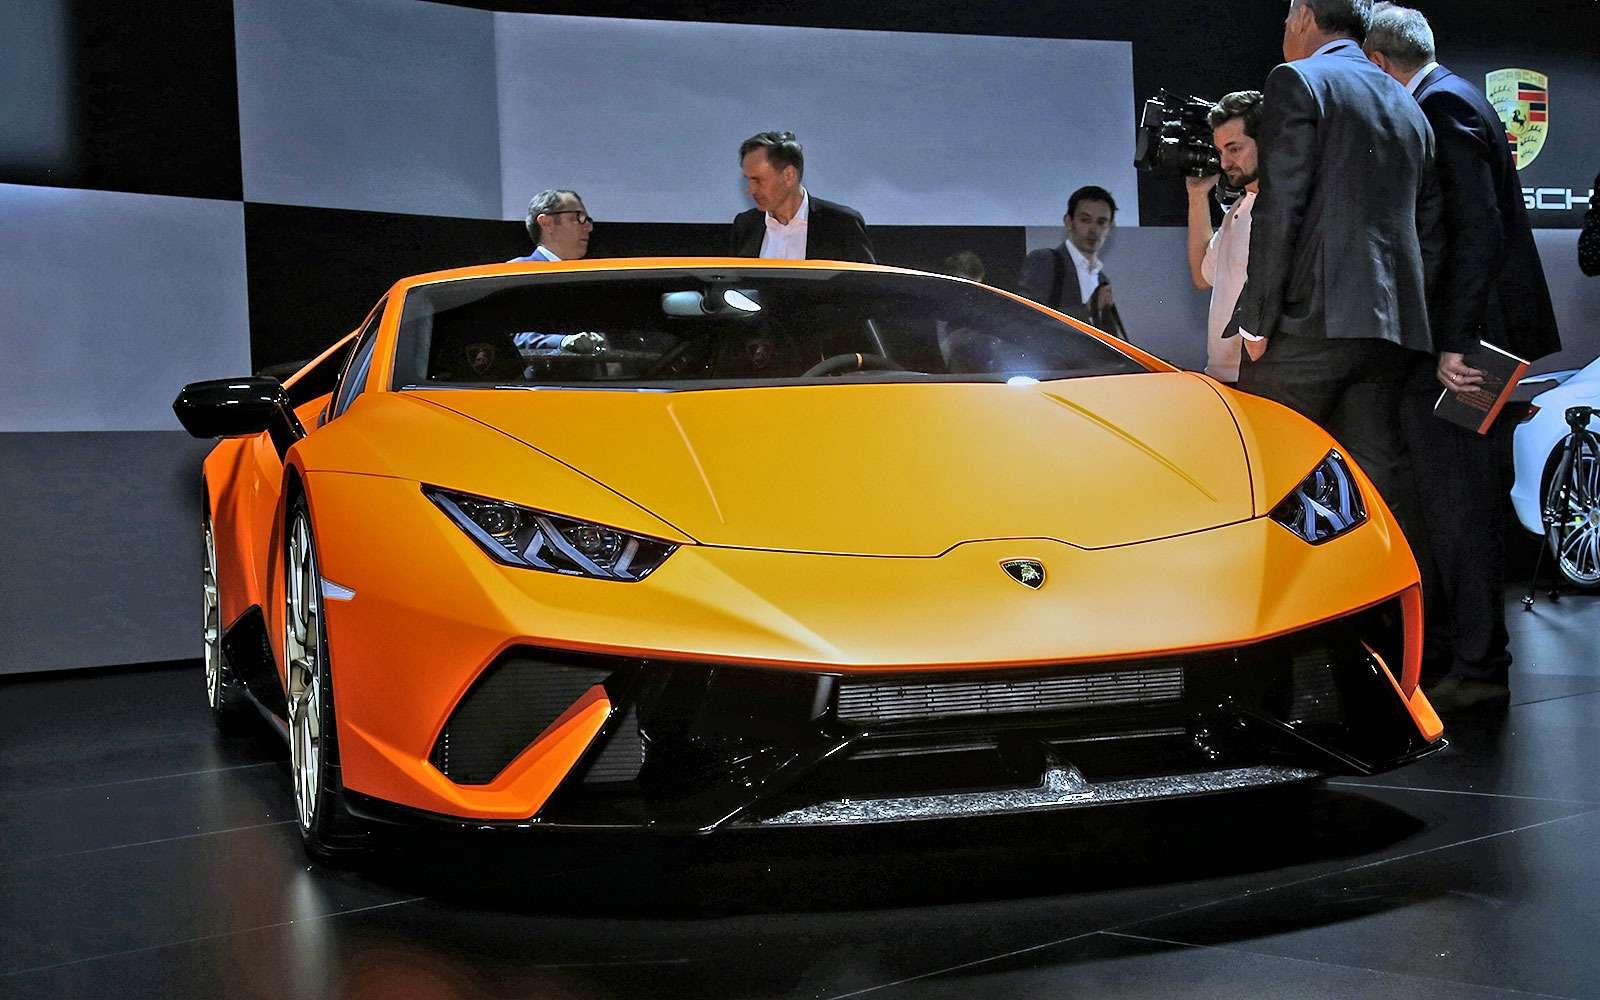 Тайны чемпиона: Lamborghini представила суперкар Huracan Performante— фото 717335